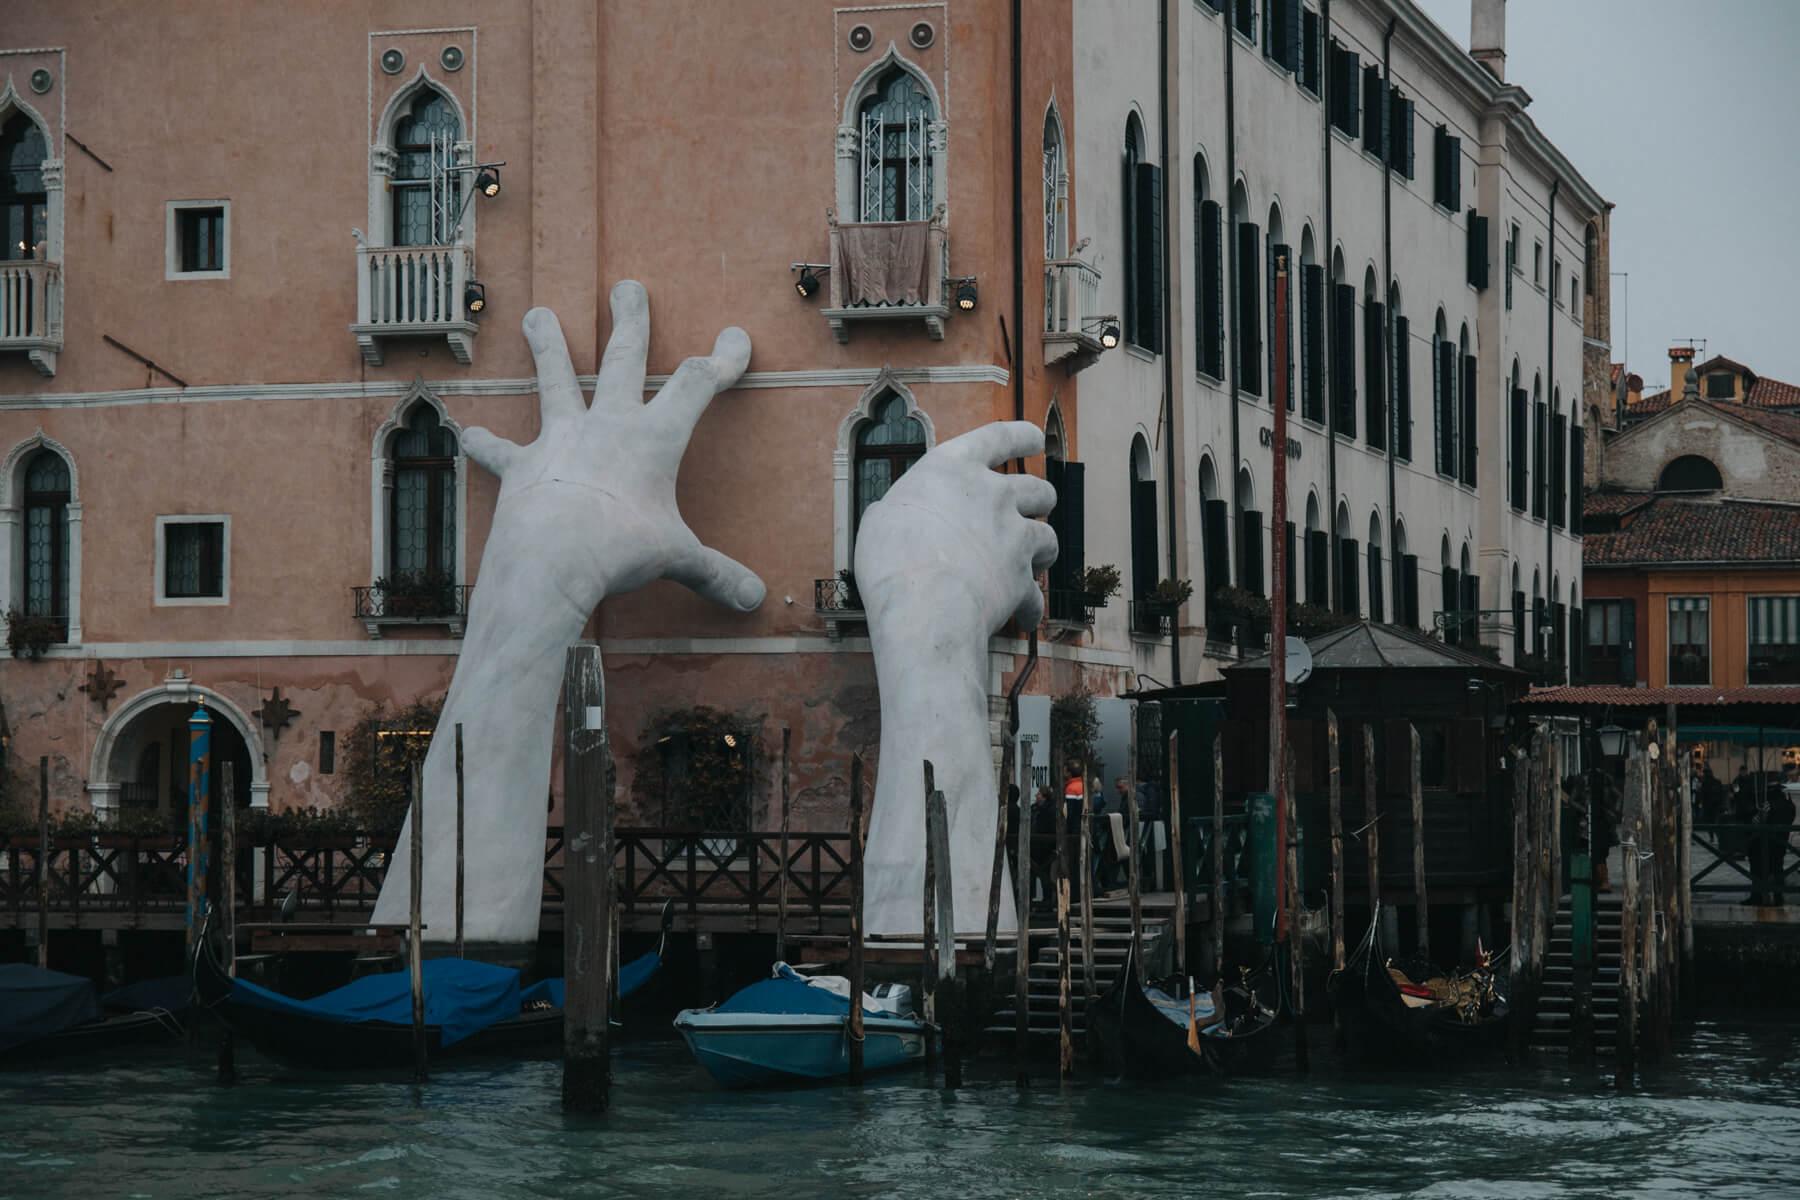 Hands Statue in Venice